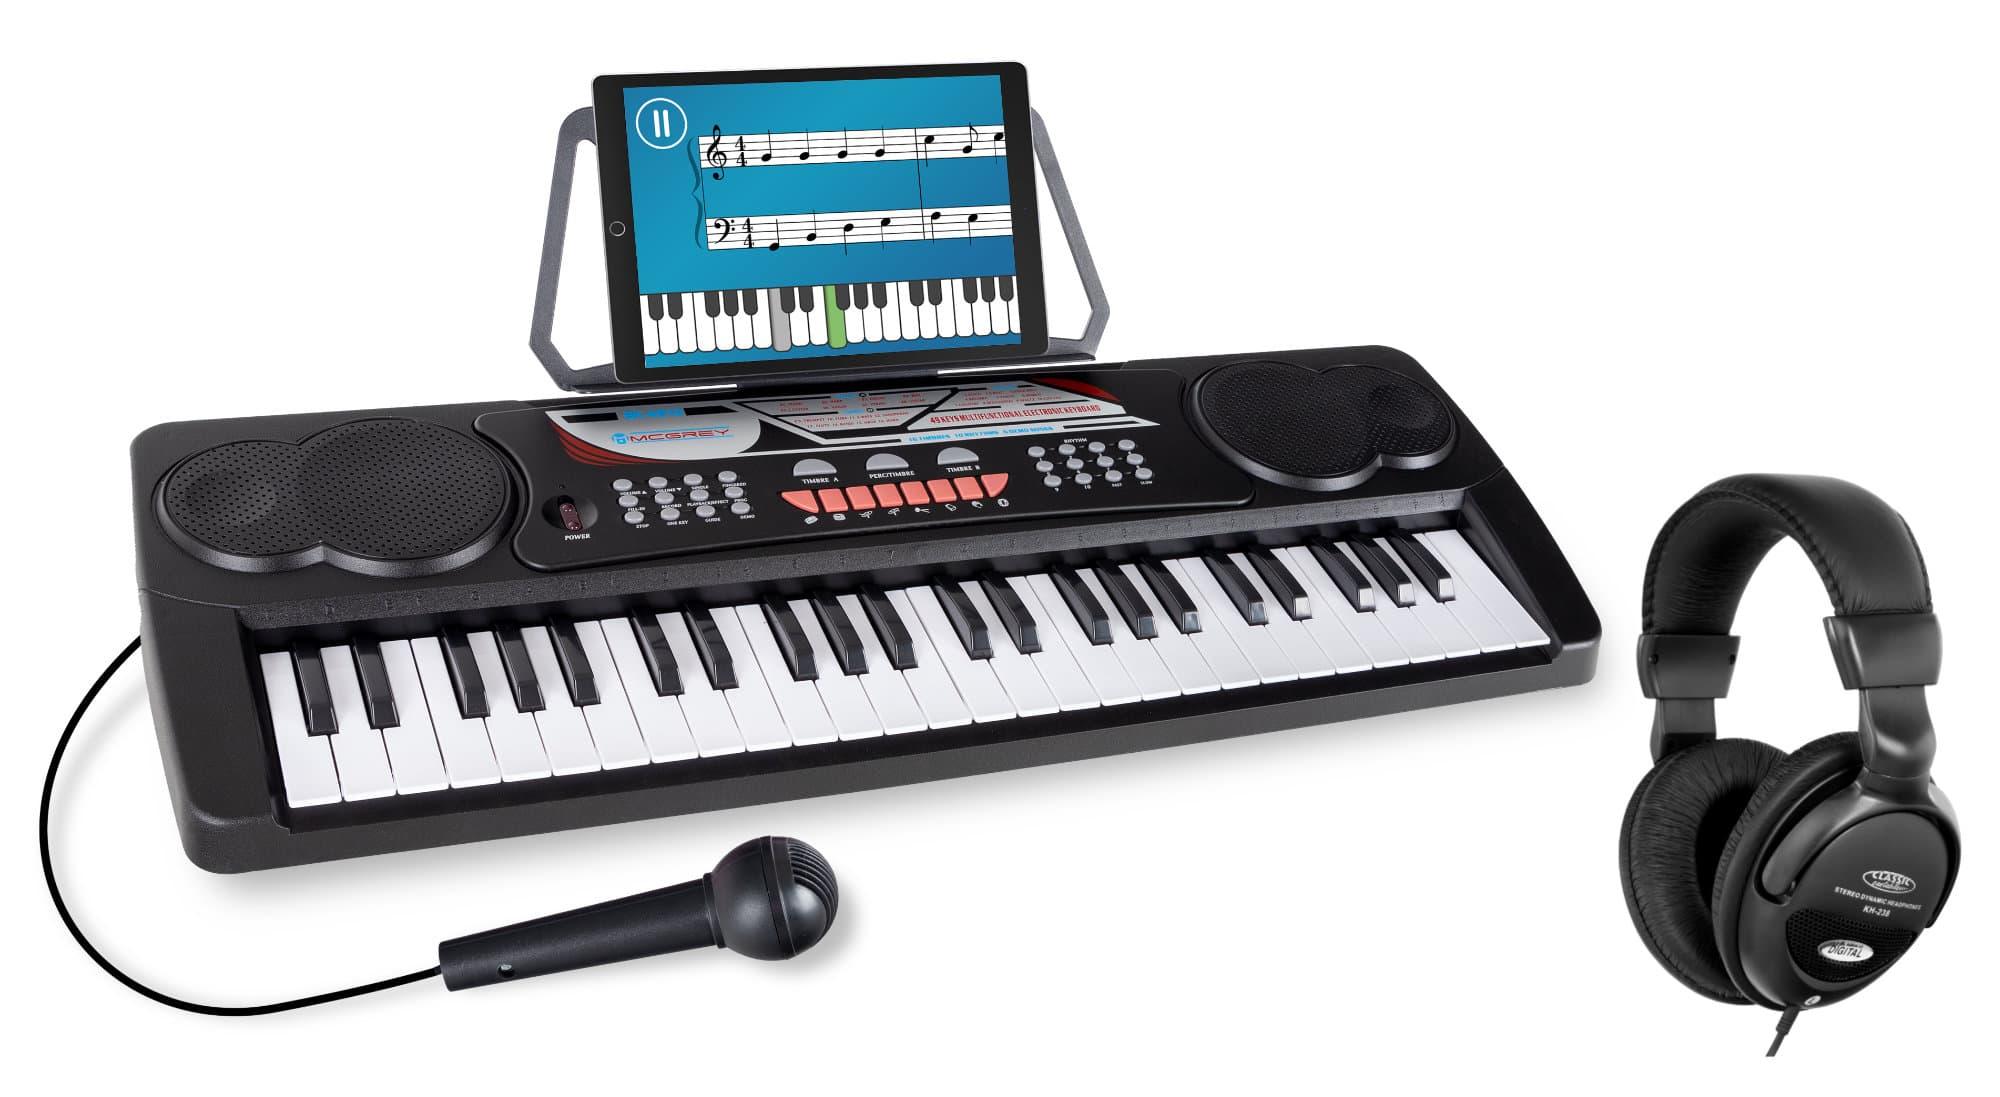 McGrey BK 4910 Beginner Keyboard SET inkl. Kopfhörer